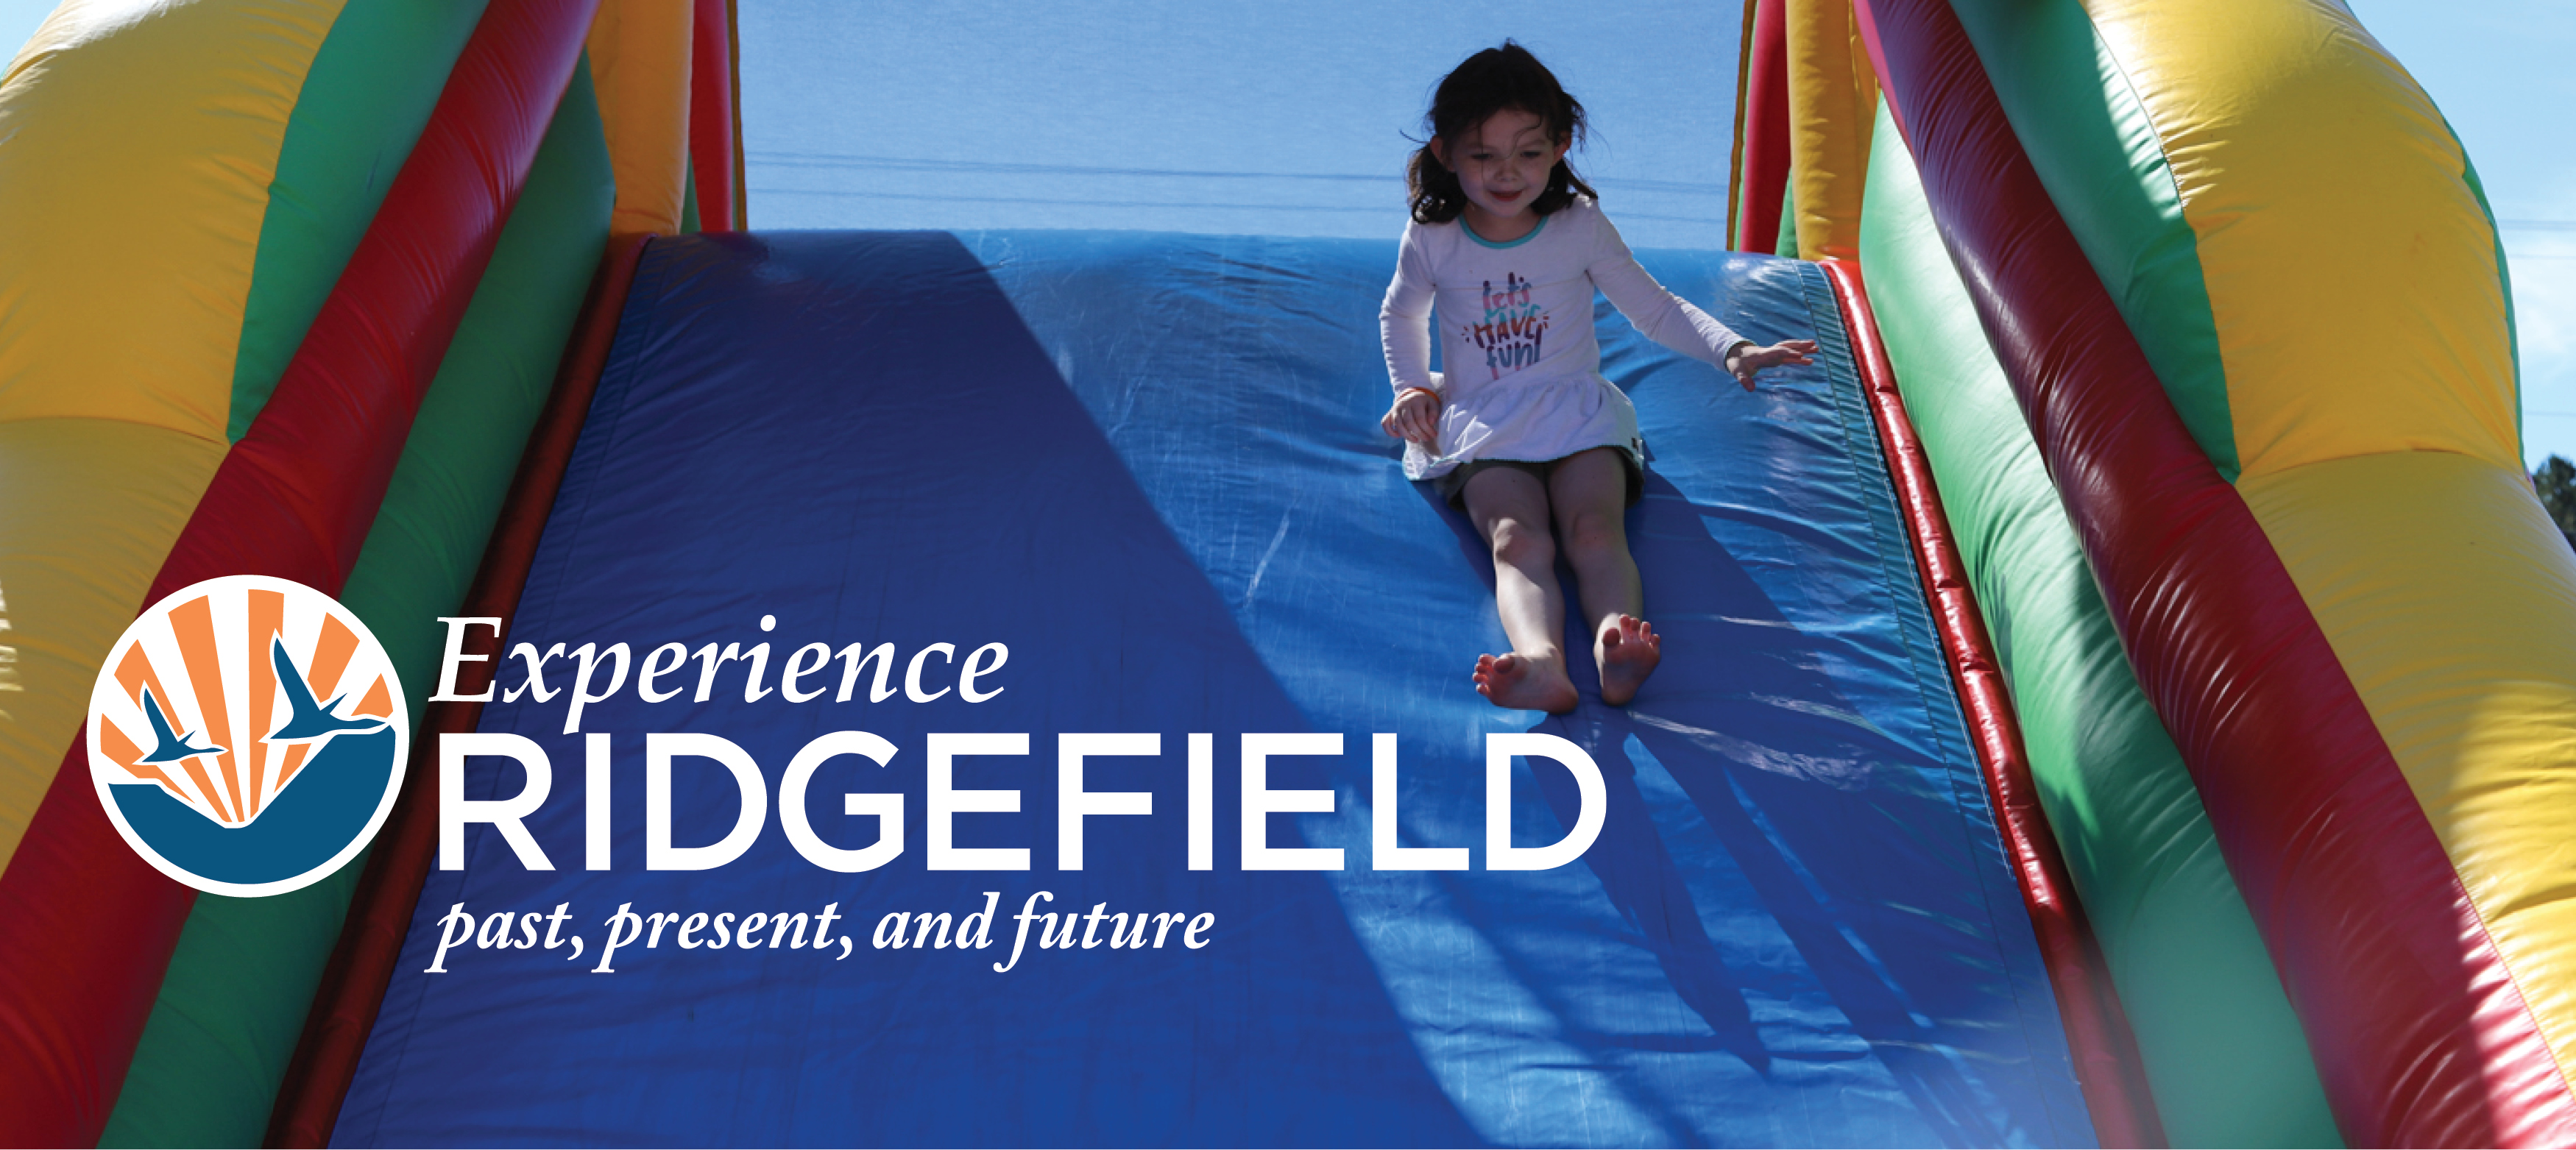 experience Ridgefield